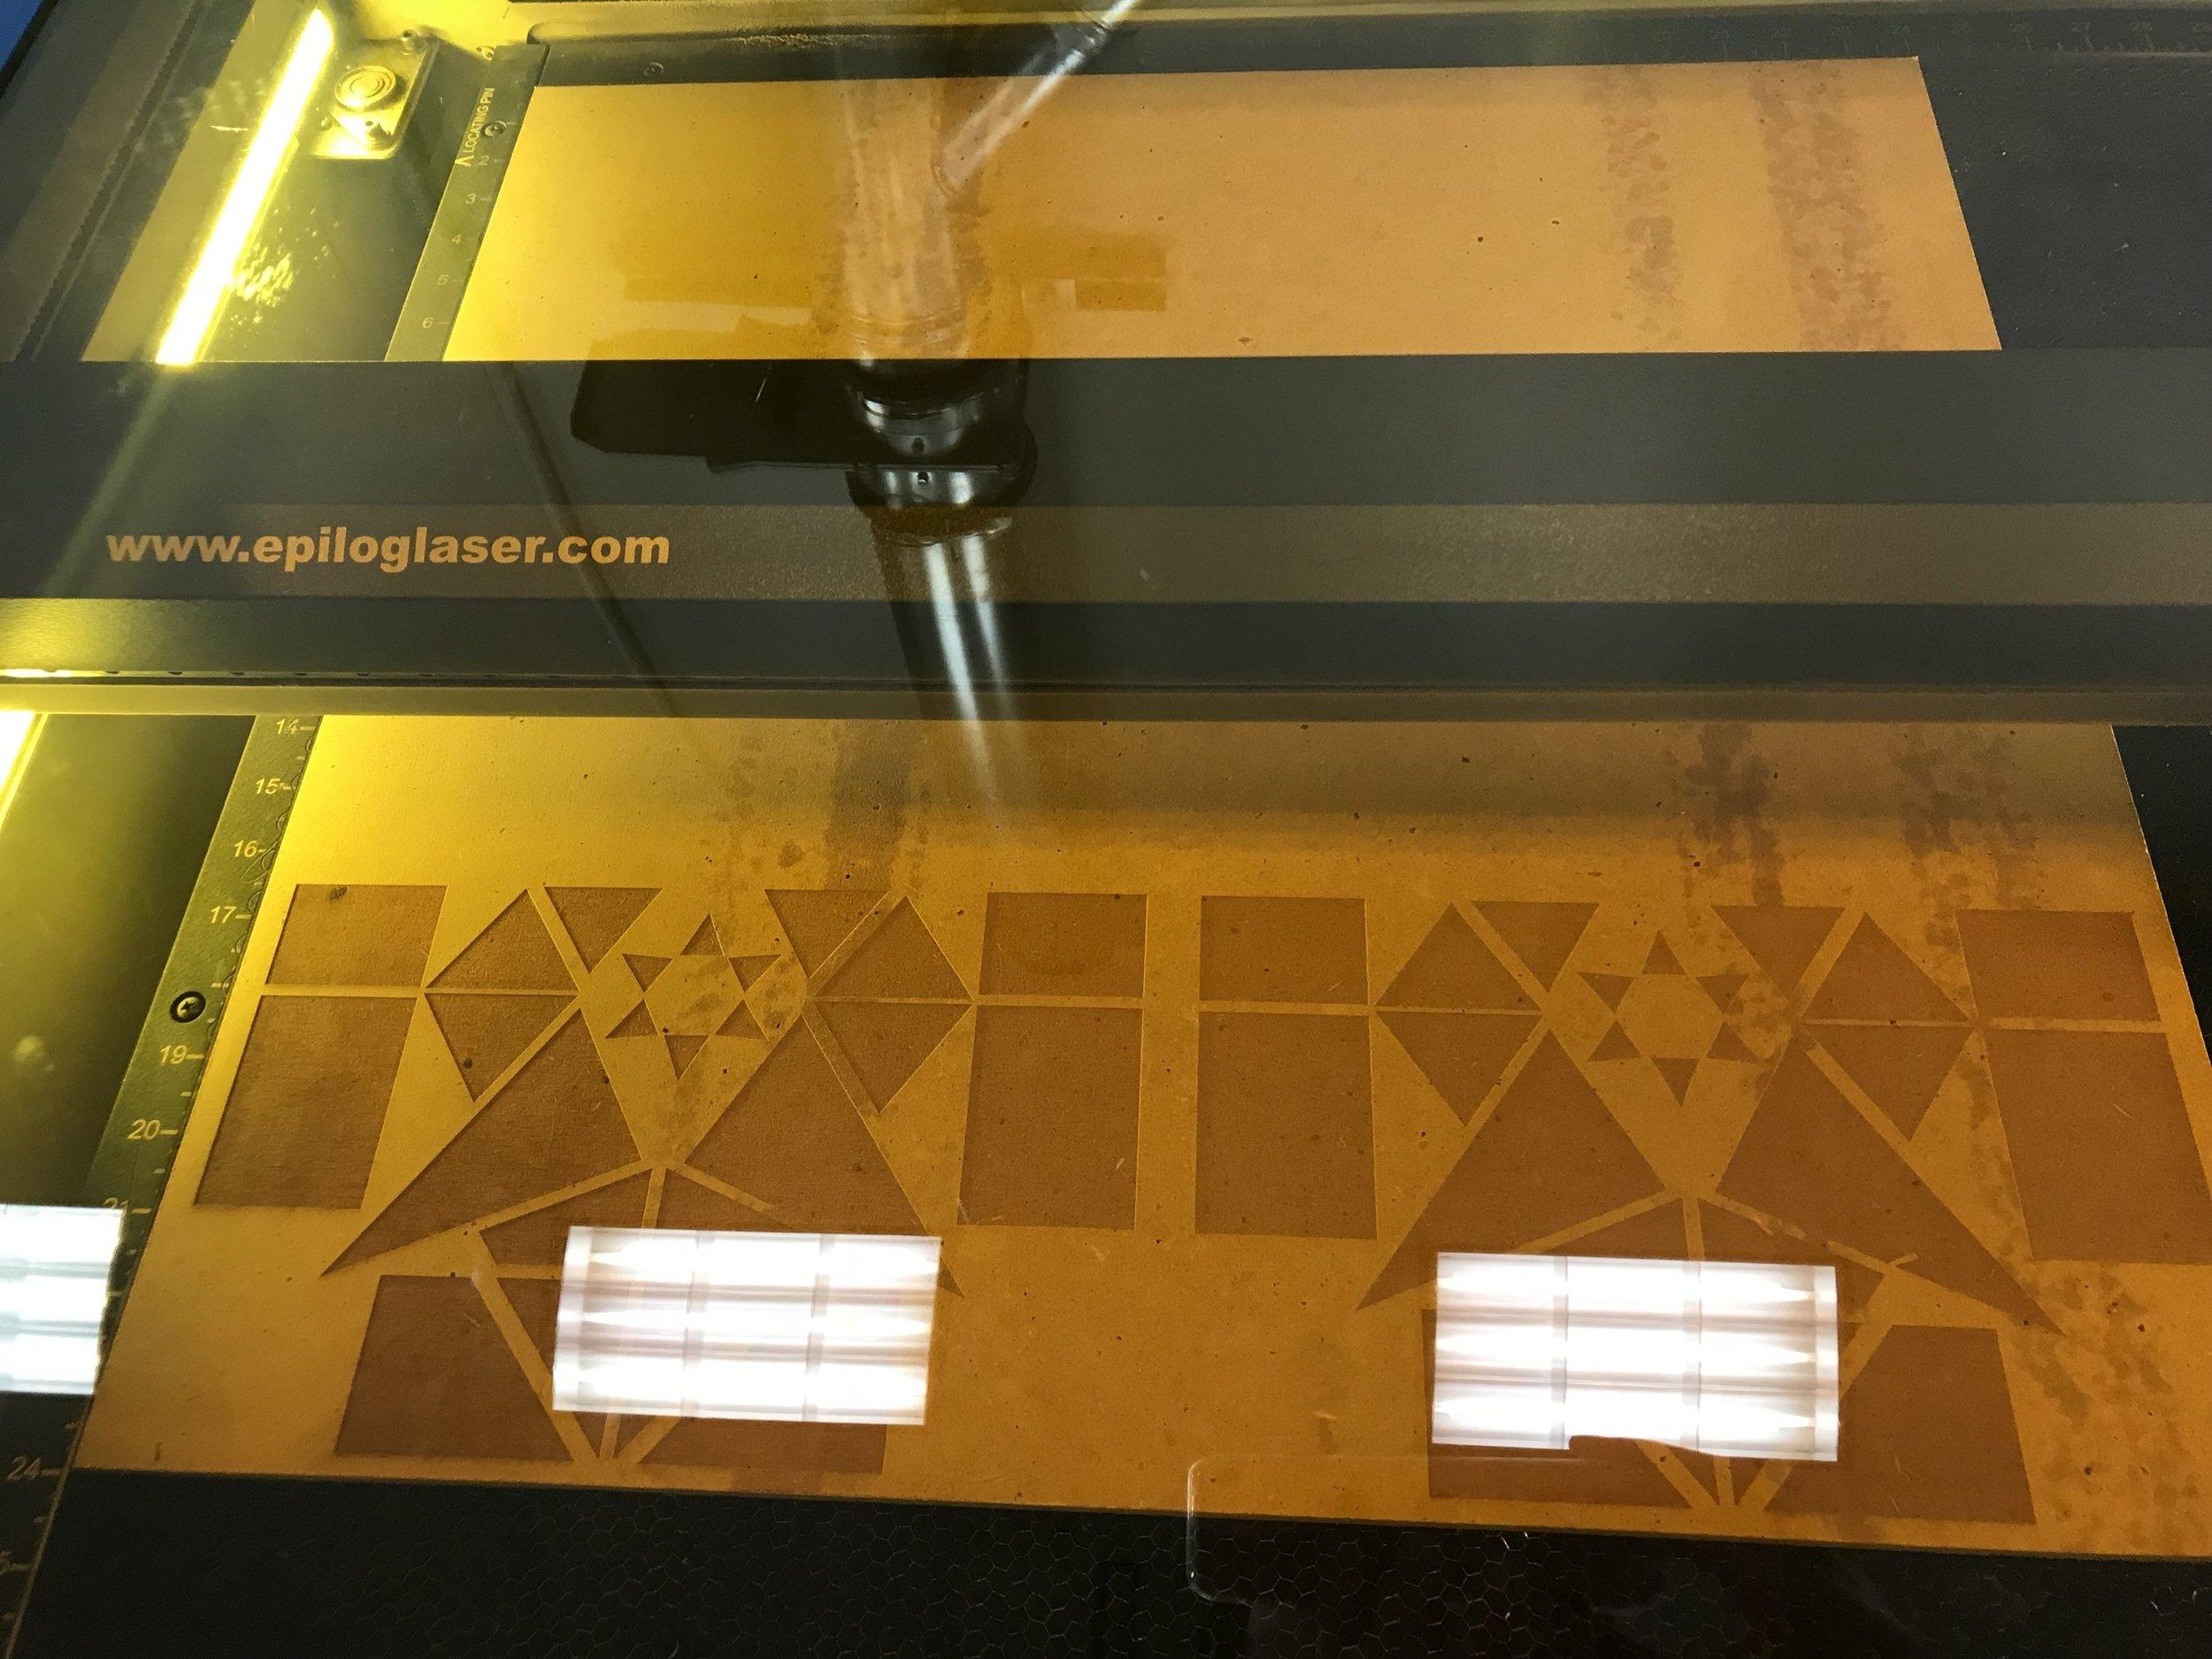 In the laser cutter!